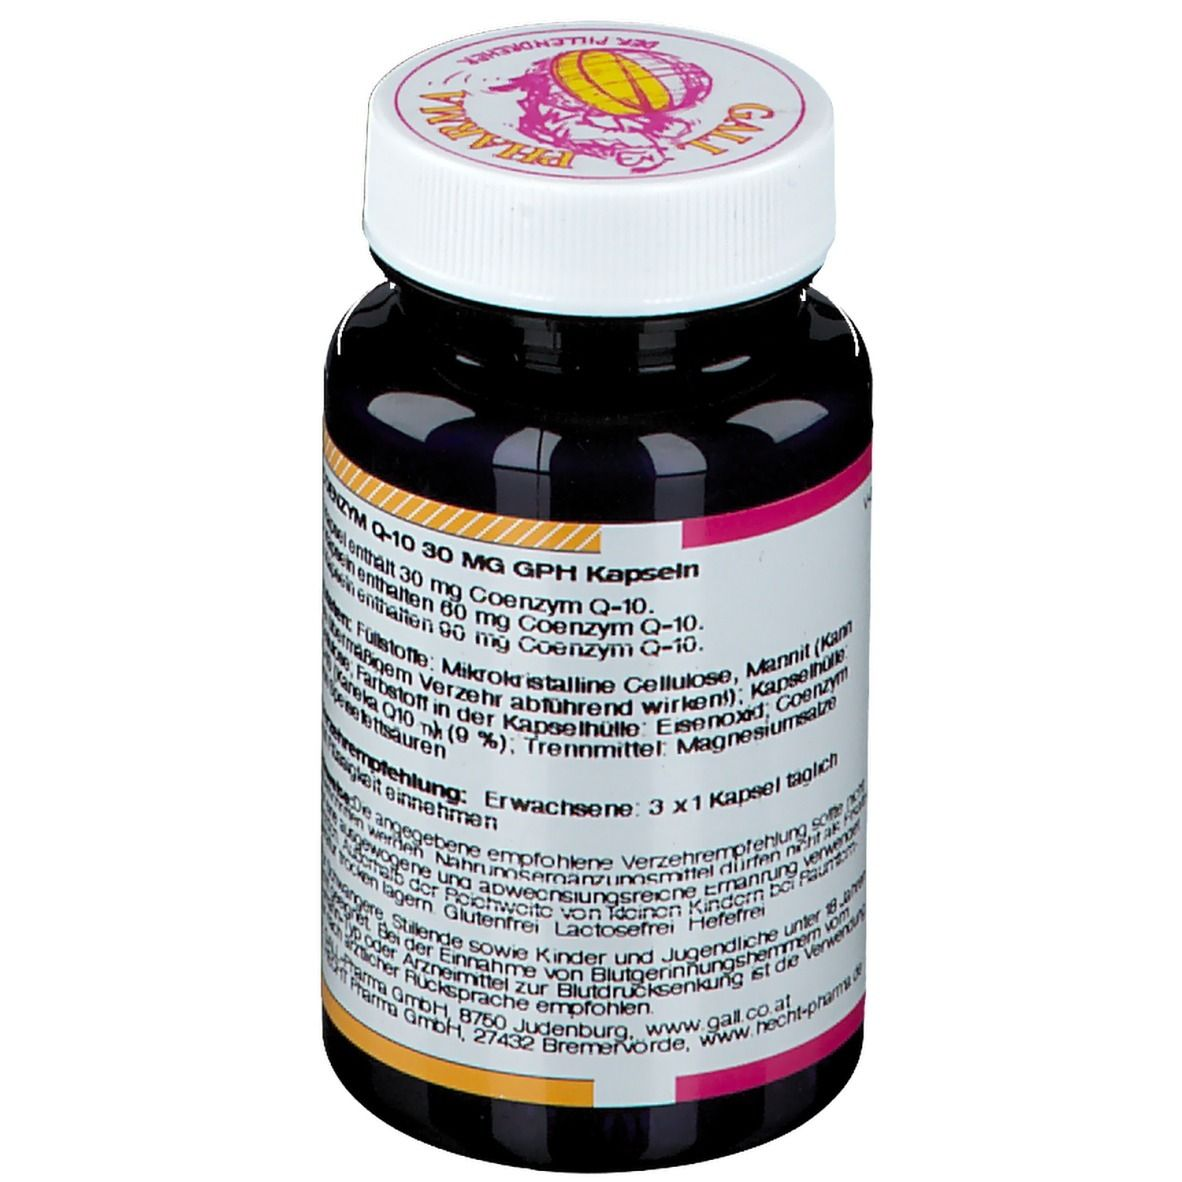 GALL PHARMA Coenzym Q-10 30 mg GPH Kapseln